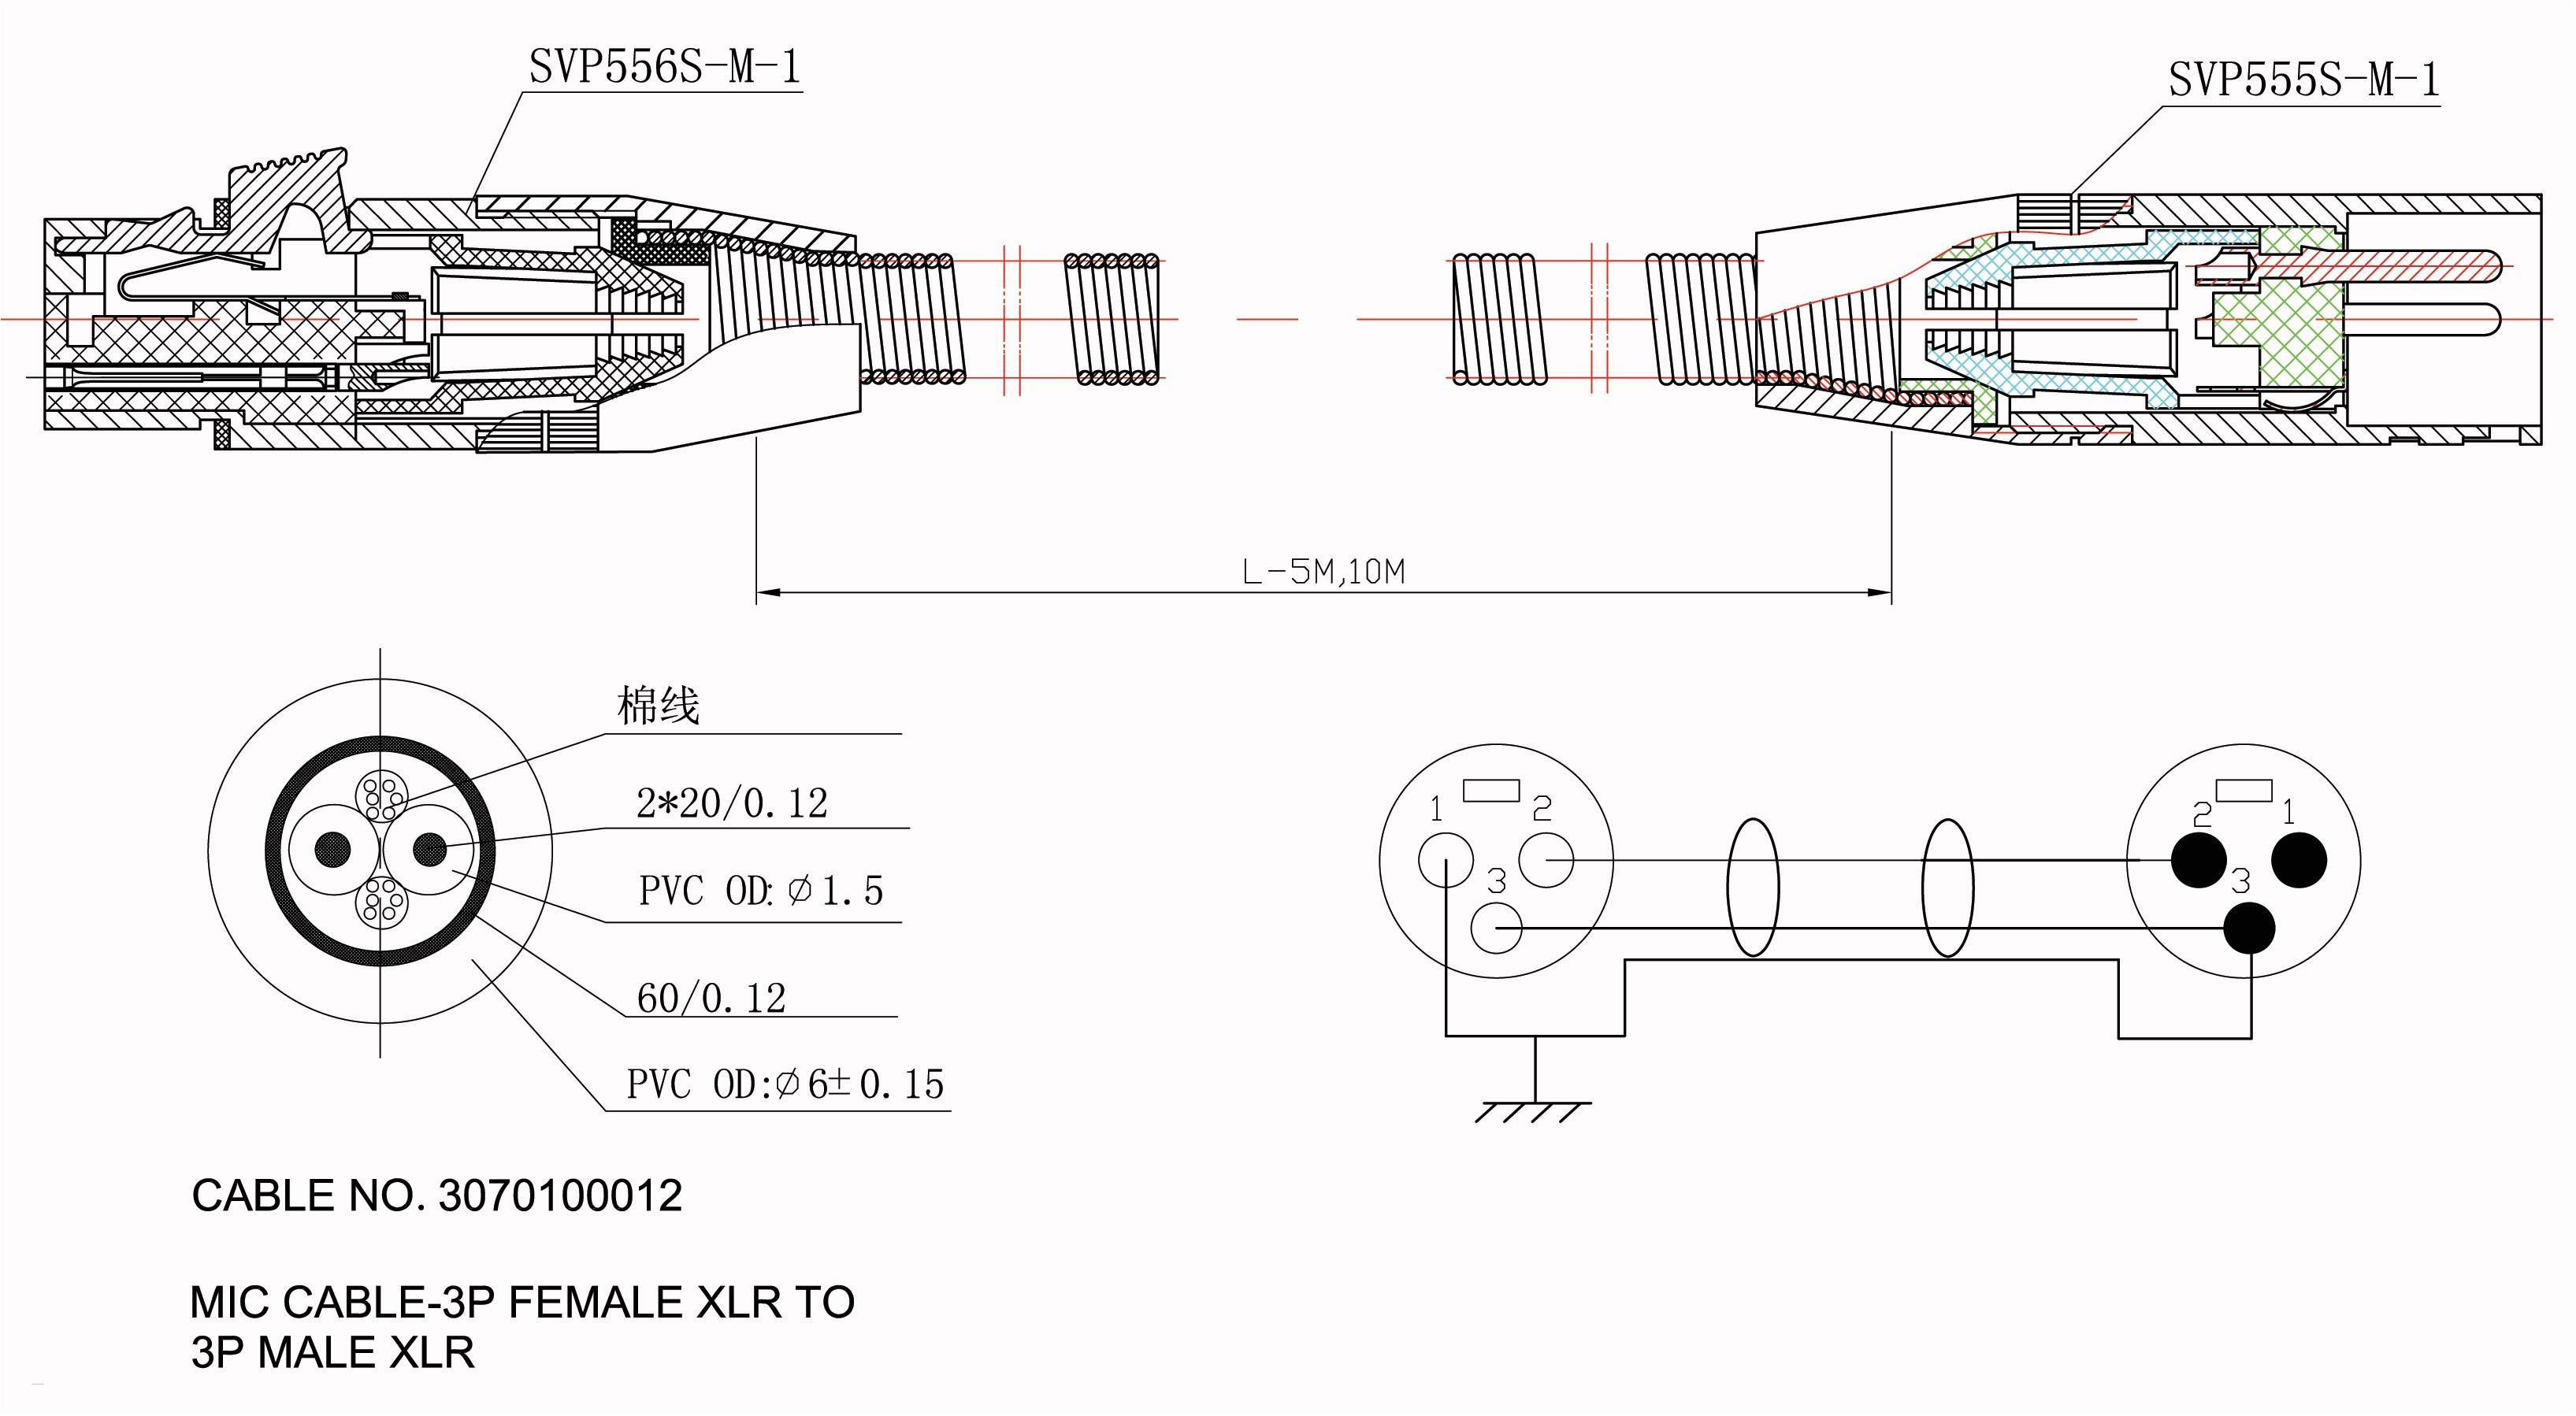 xlr wiring diagram lable wiring diagram autovehiclewiring xlr jack acoustic wiring diagrams favoritesxlr wiring diagram lable